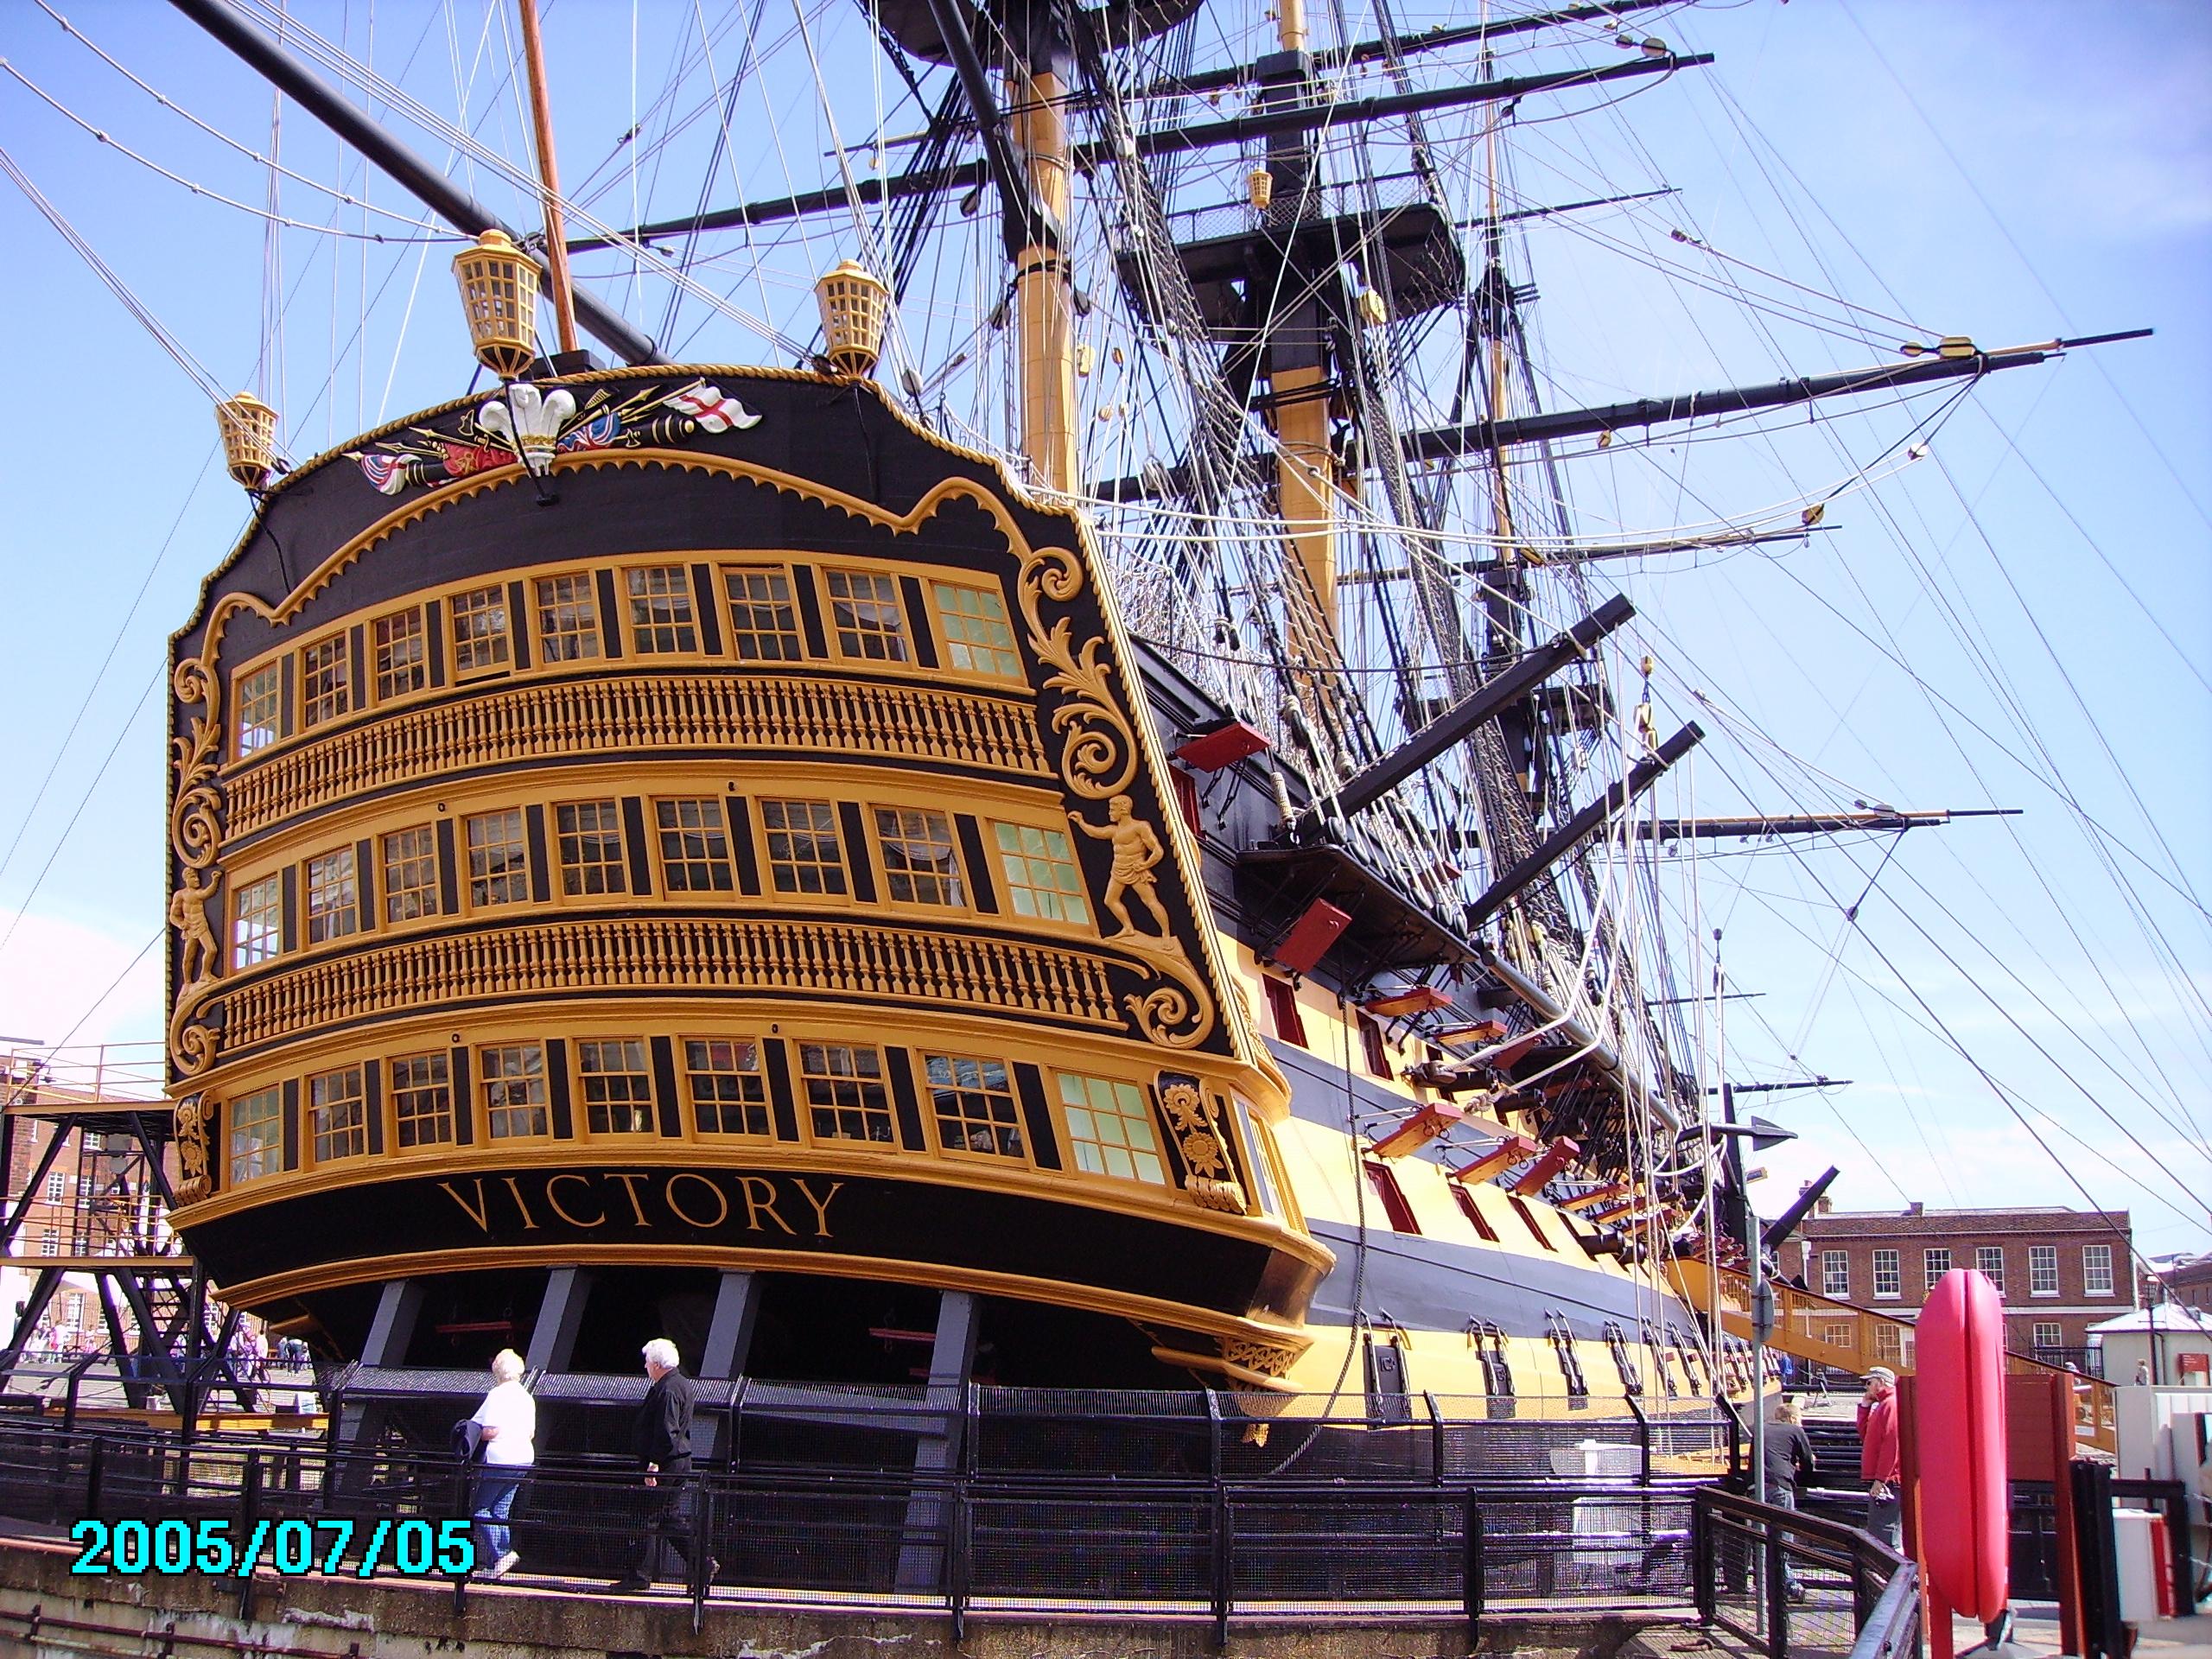 Baubericht HMS Victory 1:98 von Mantua - Seite 2 Effd85f64f20e26c2422b41773c56431